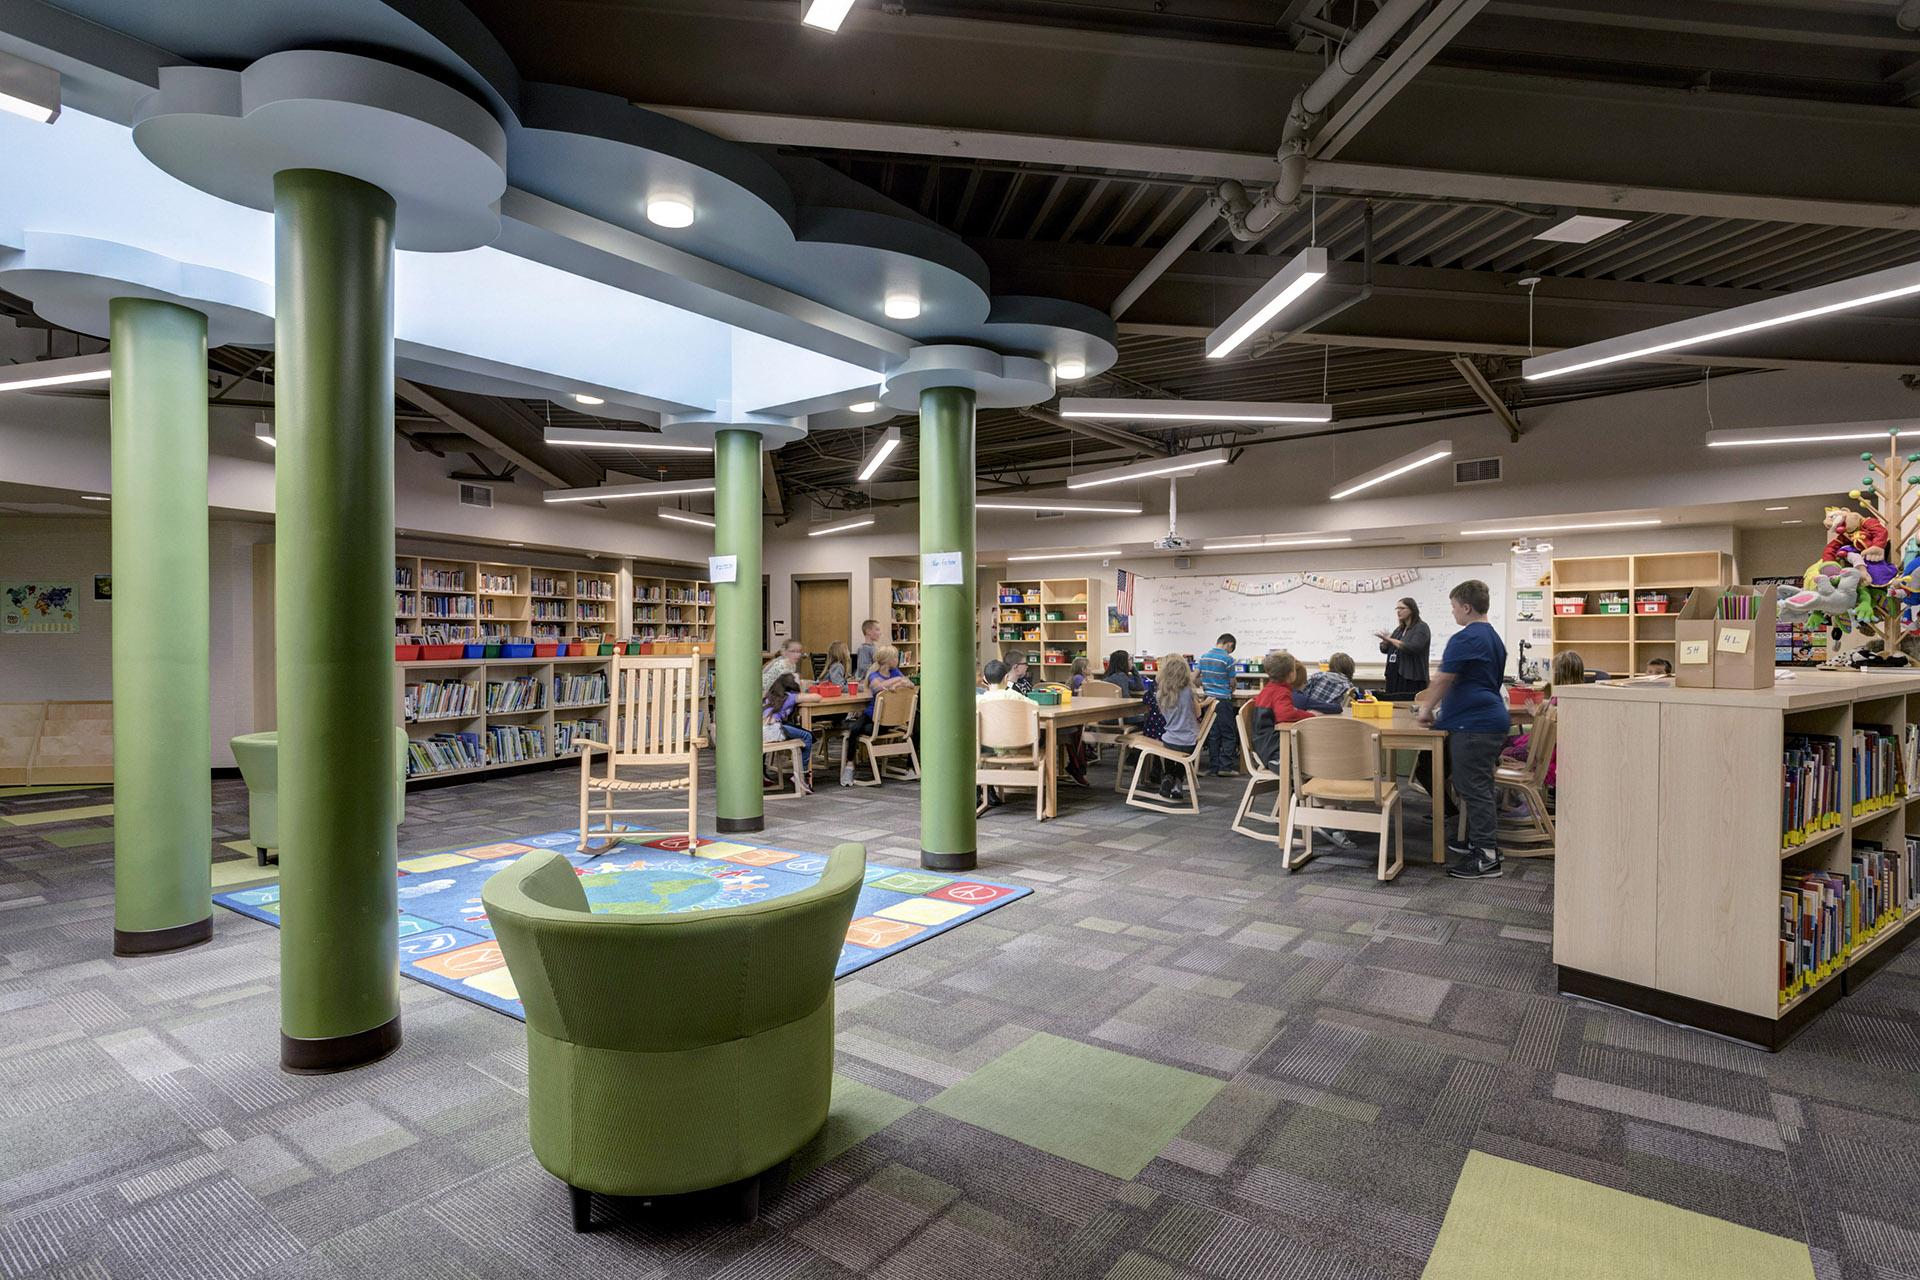 Greenacres Elementary Library